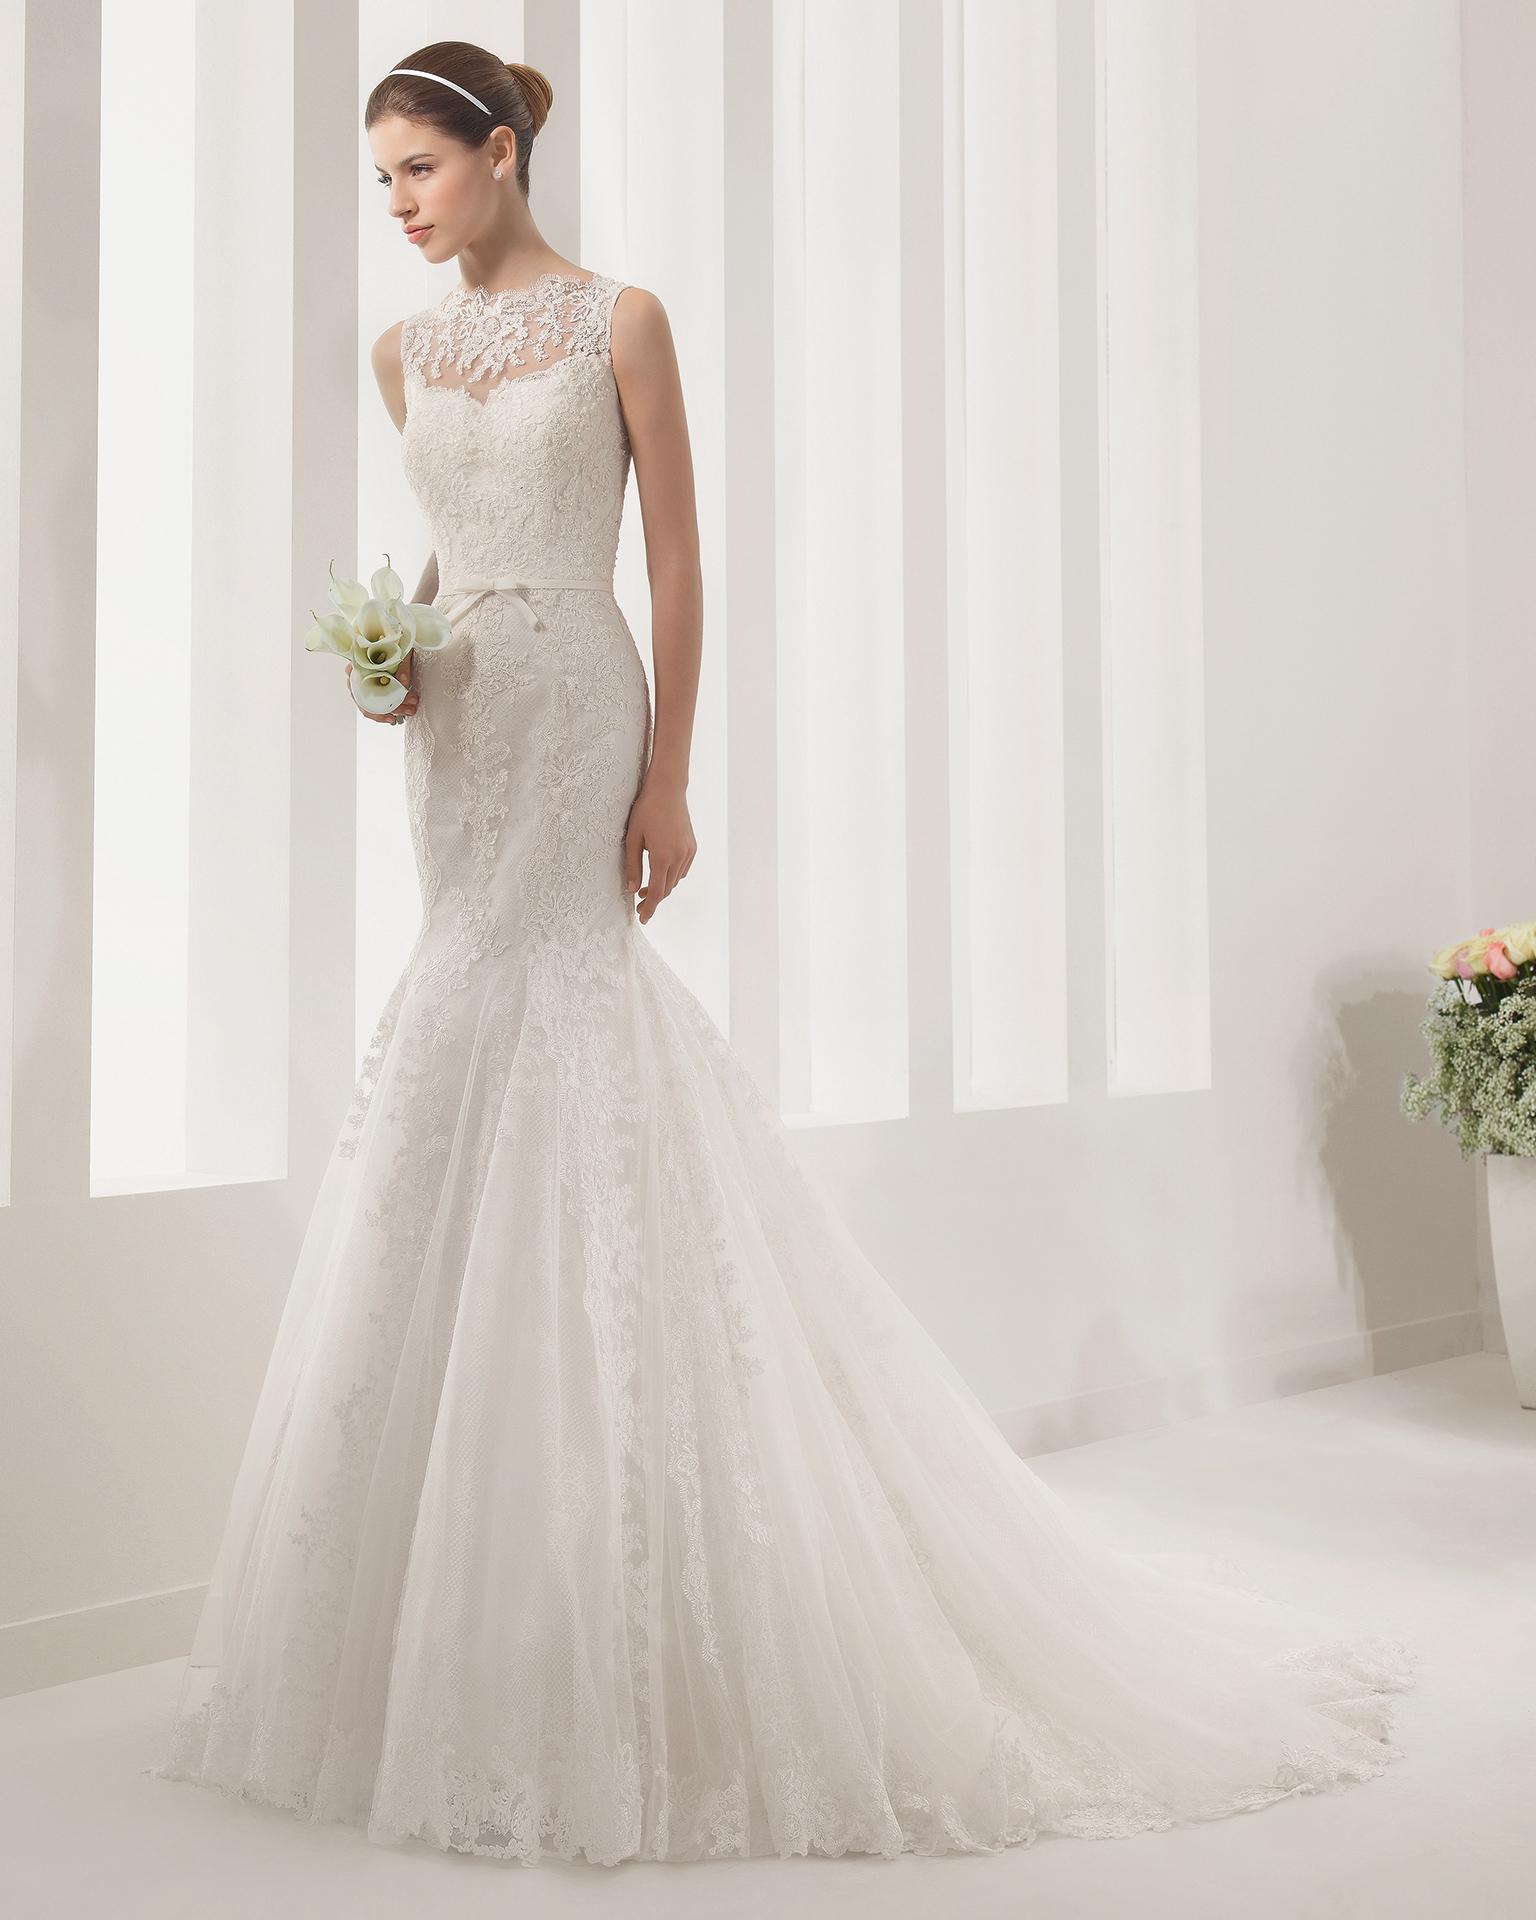 Alma Novia Pausa Illusionneckline Scallop Bowbelt Modern Feminine Poshbridallanc Posh Wedding Gown Wedding Dresses Designer Wedding Dresses Dresses [ 1920 x 1536 Pixel ]